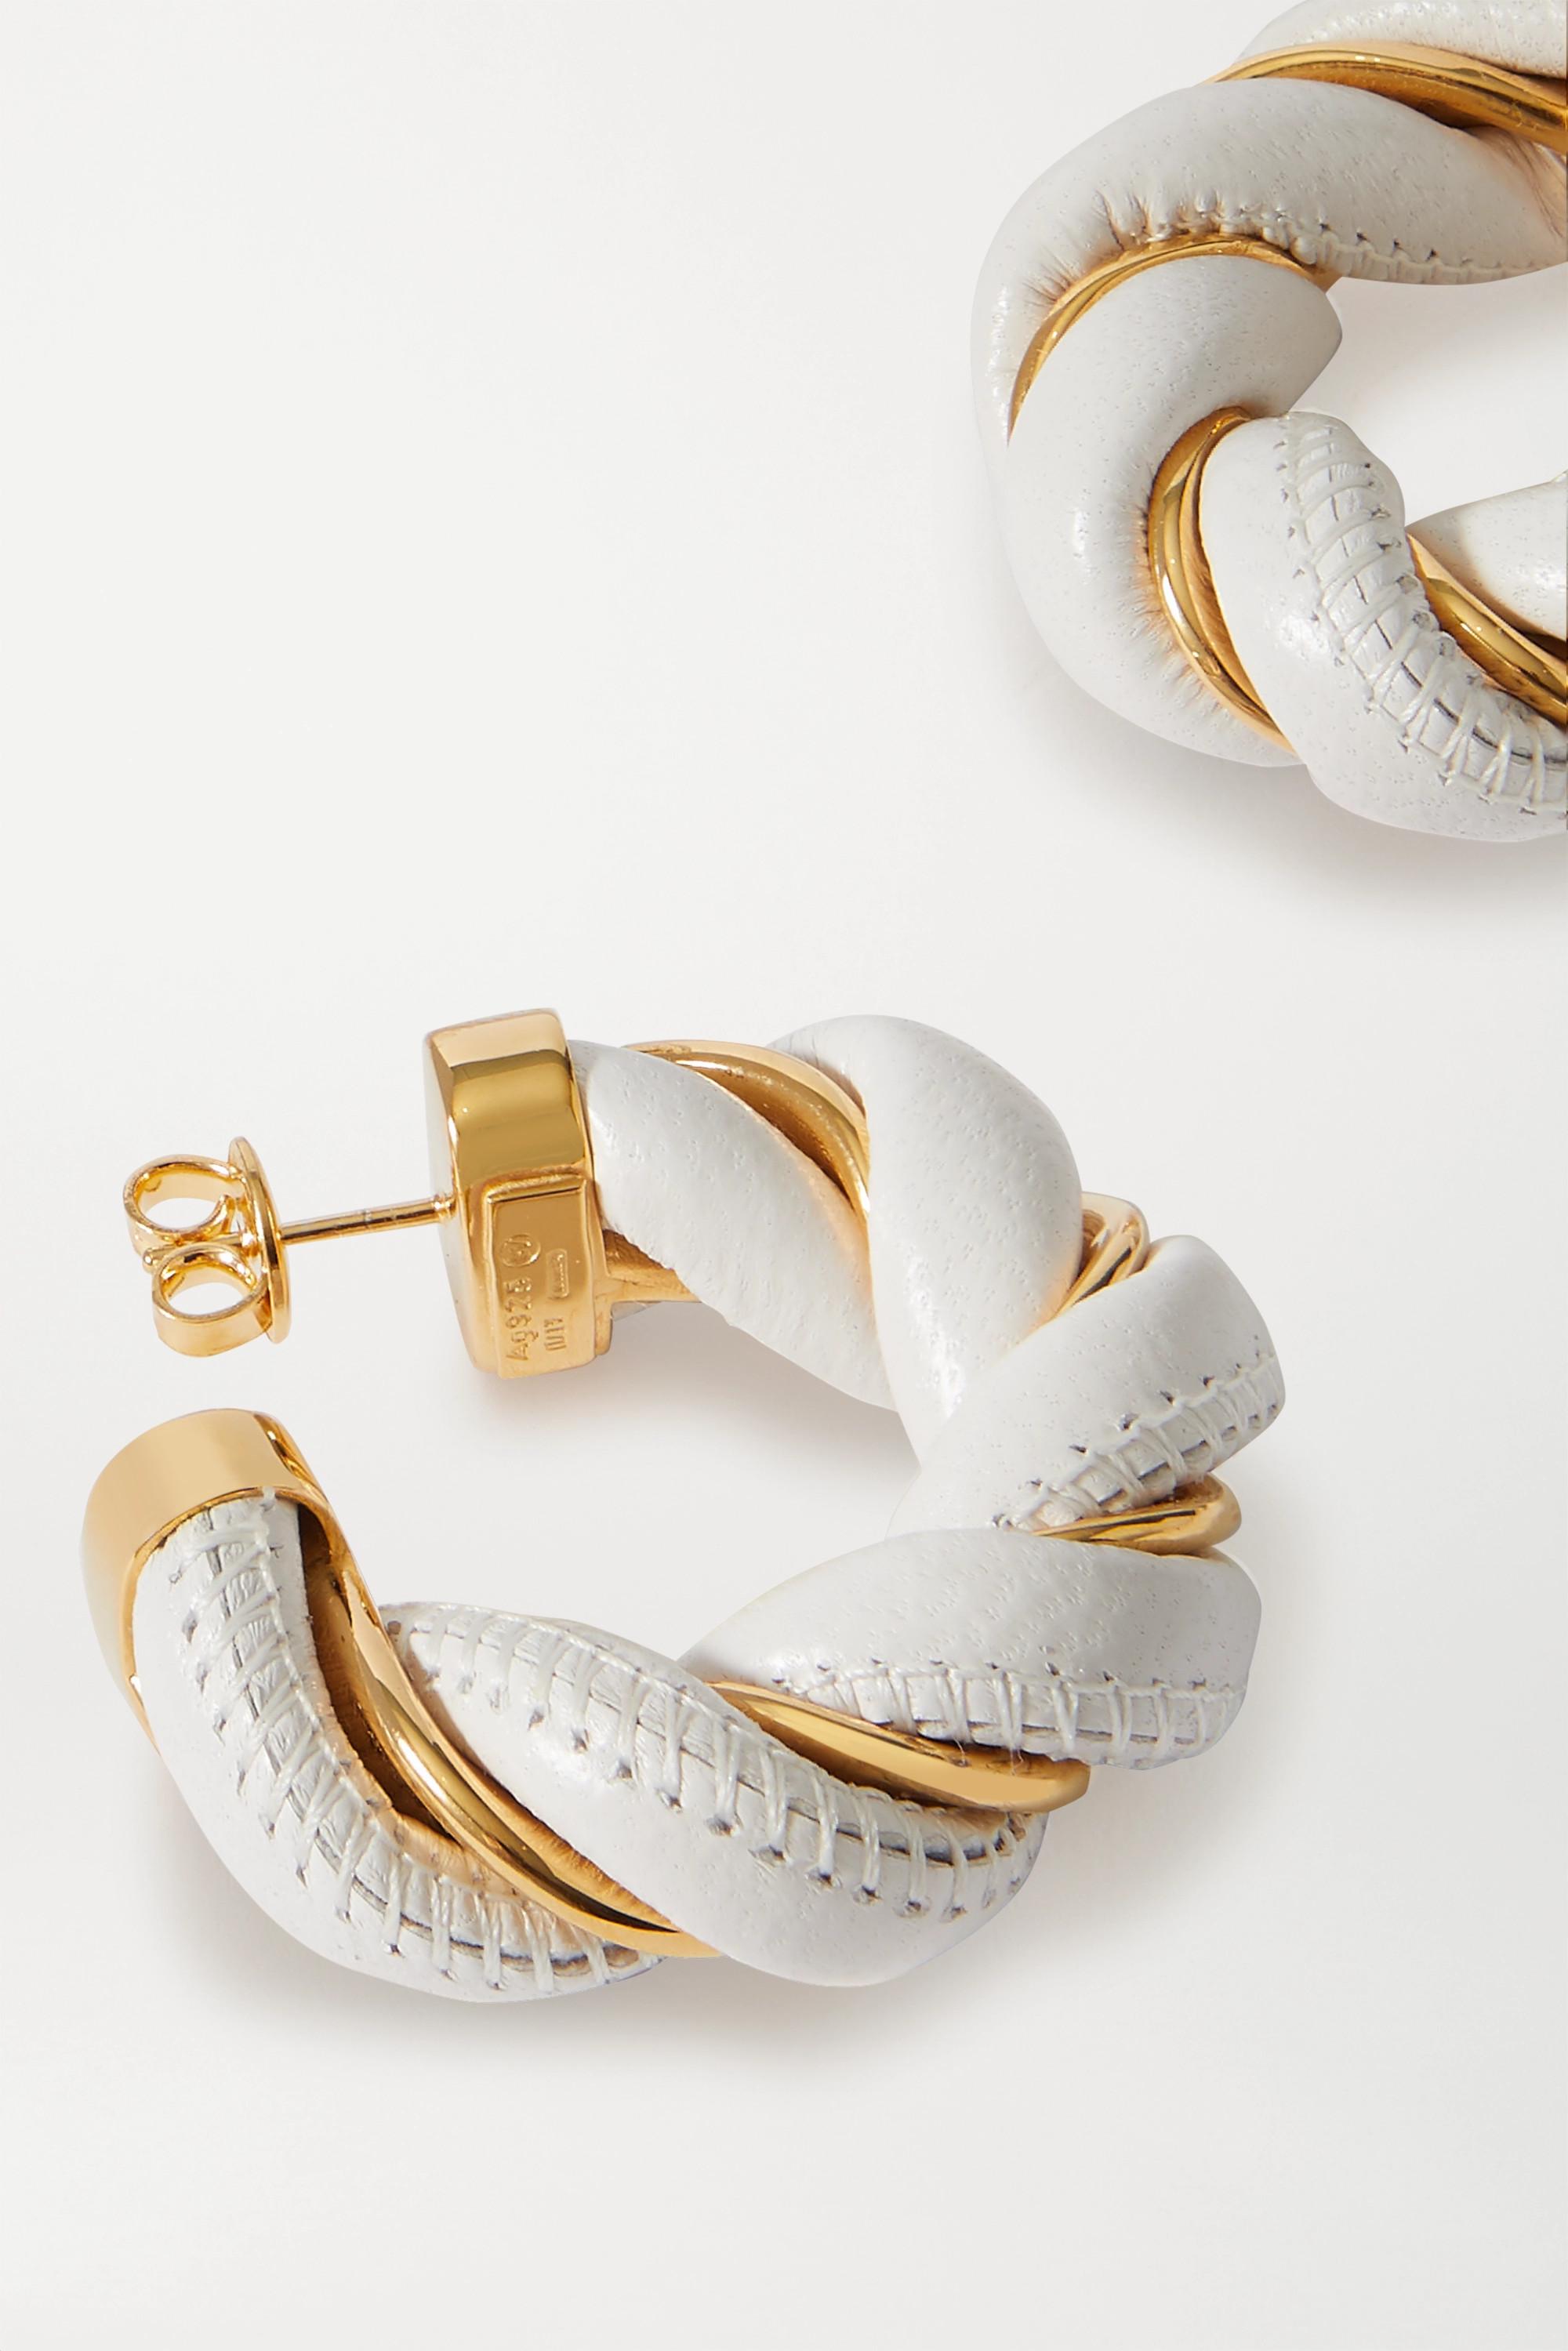 Bottega Veneta Goldfarbene Creolen mit Details aus Leder